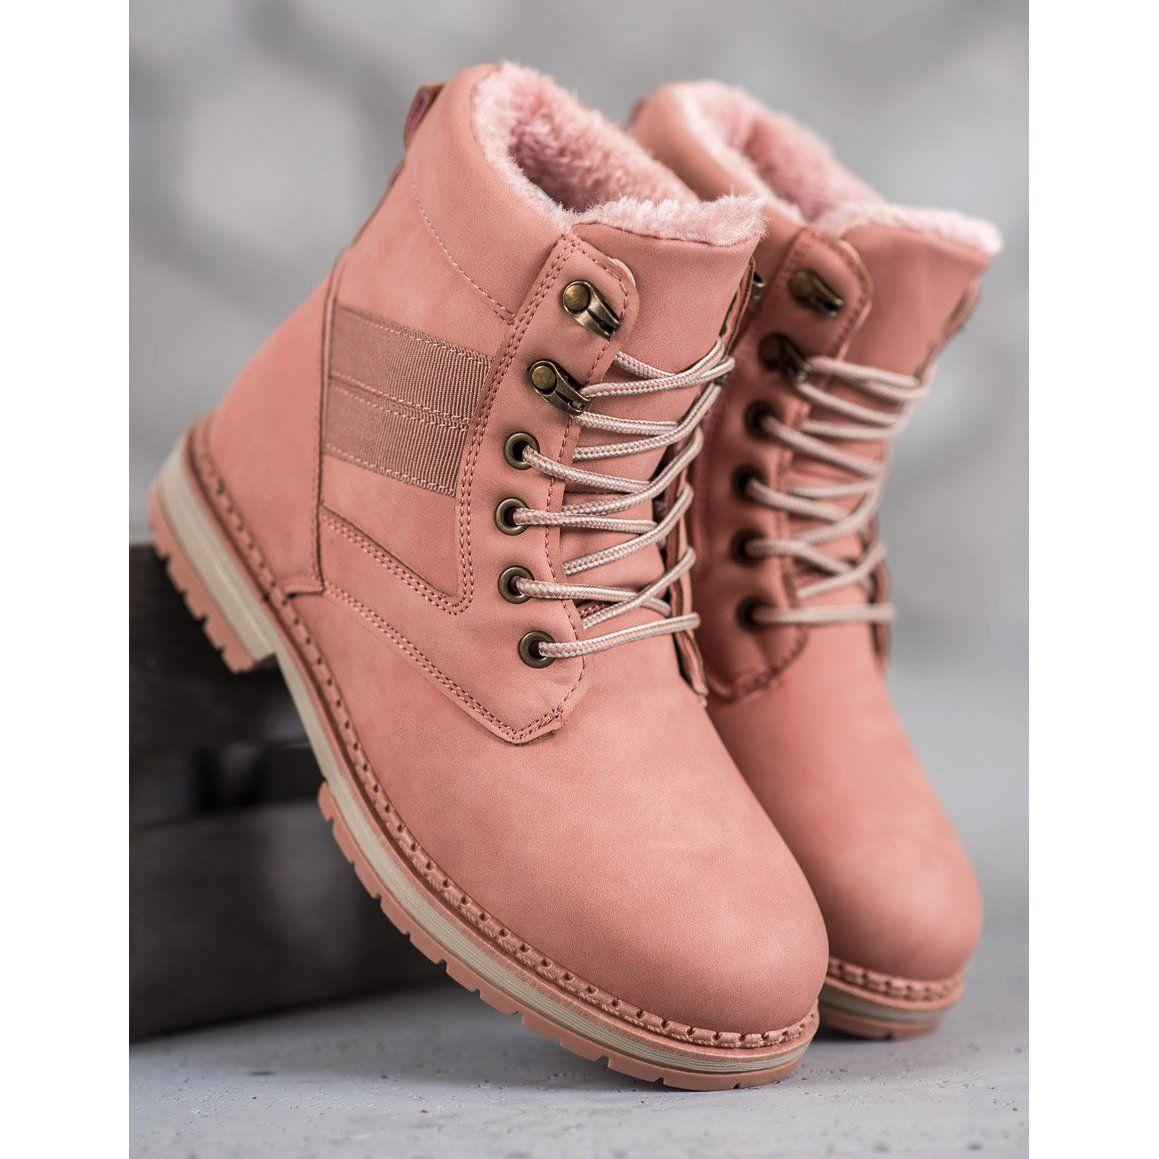 Damskie Shelovet Shelovet Rozowe Buty Zimowe Boots Shoes Timberland Boots